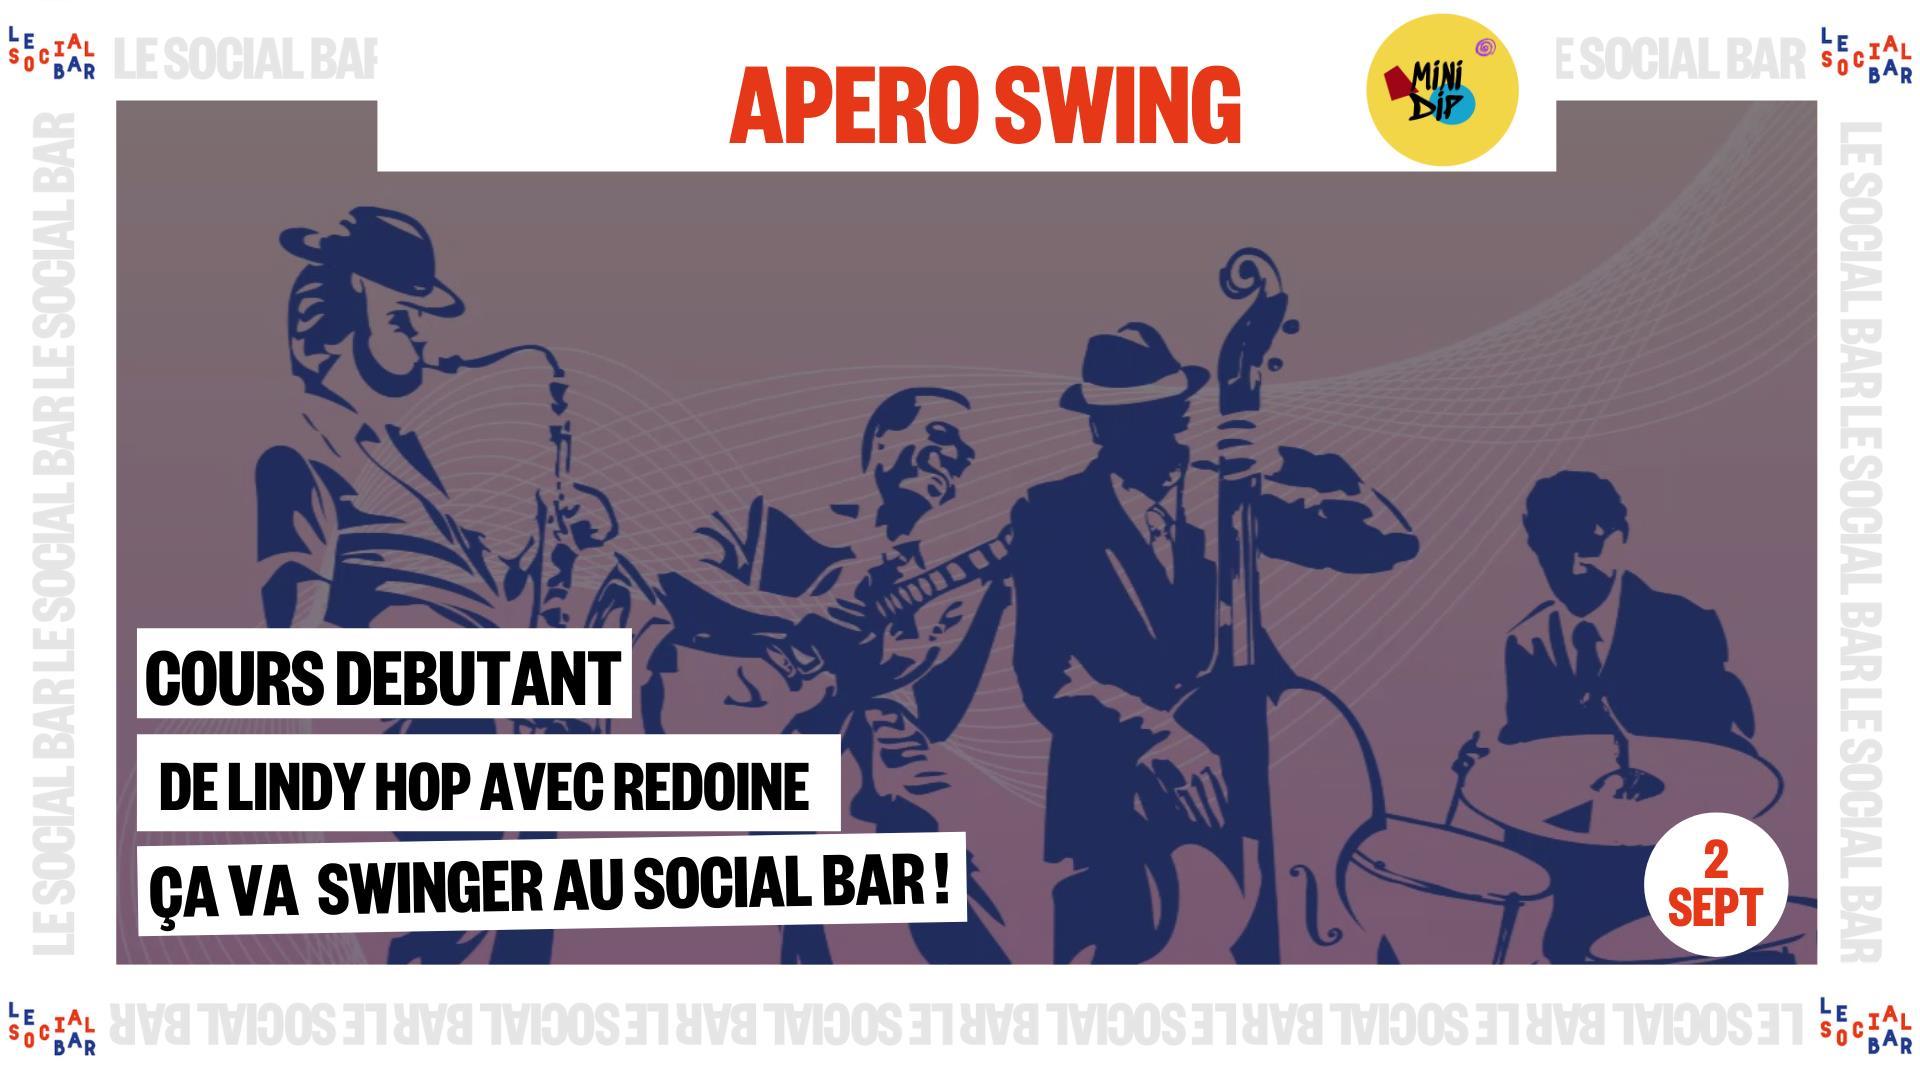 Apero Swing